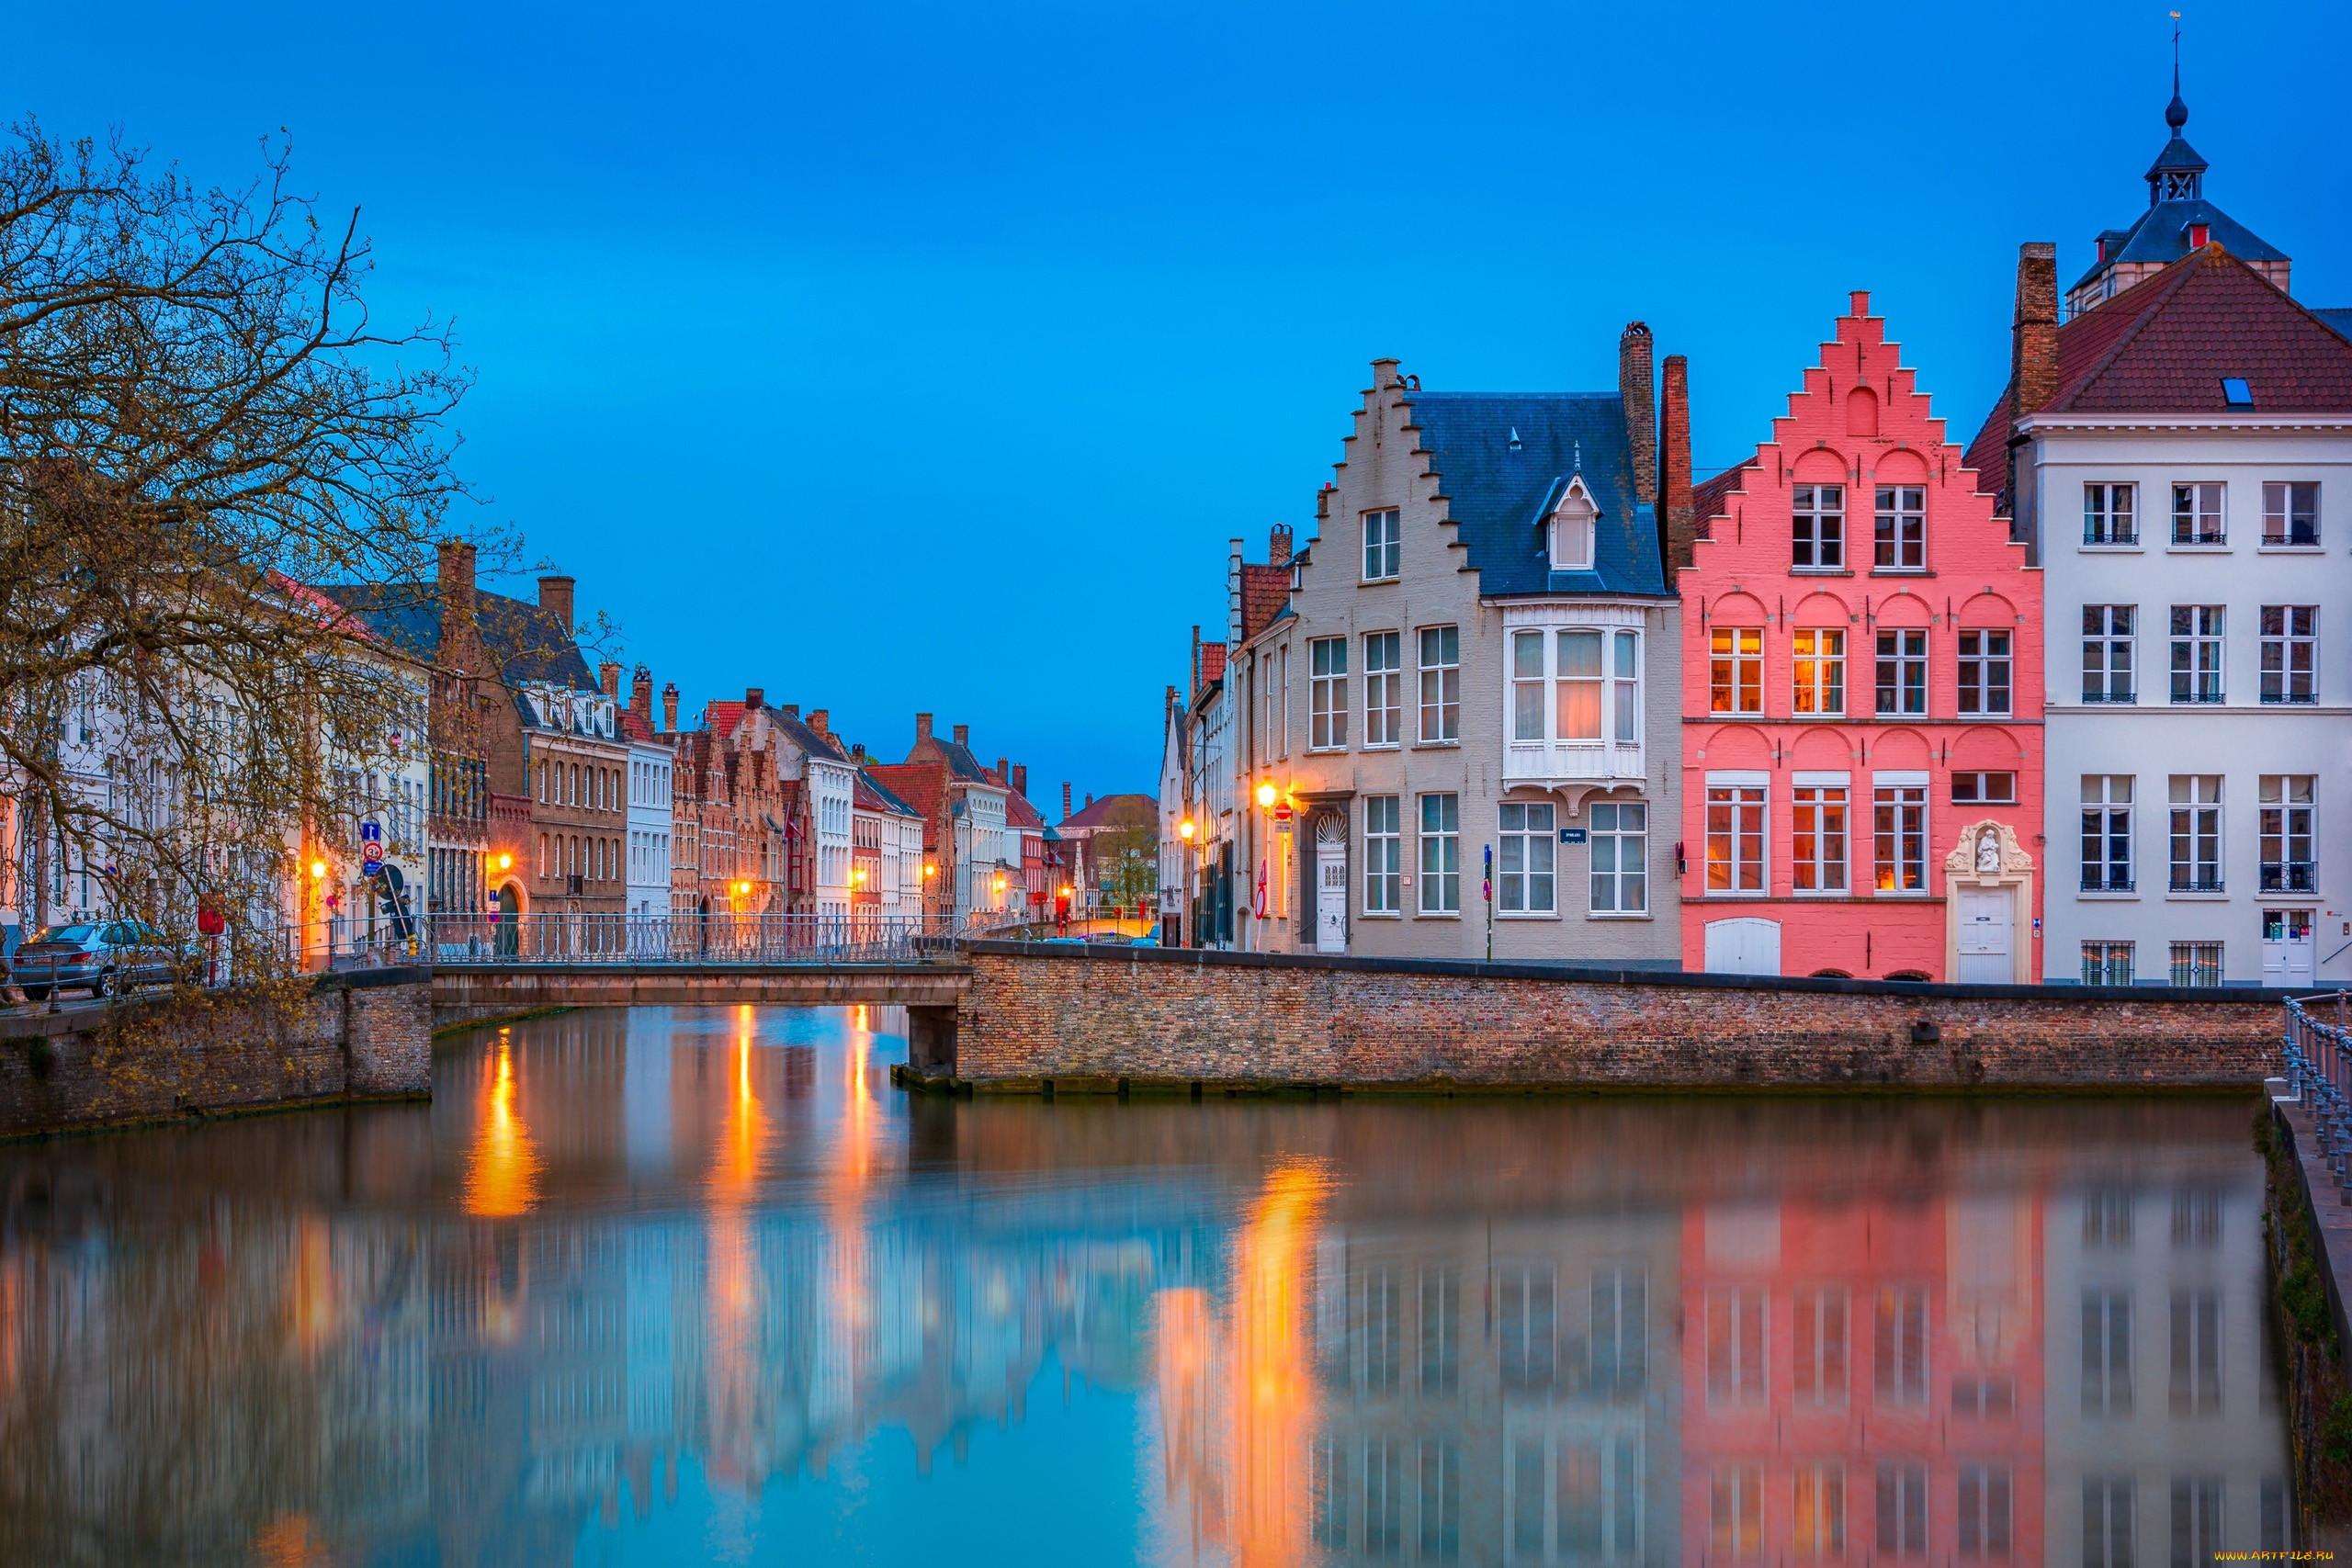 города, брюгге , бельгия, канал, мост, вечер, огни